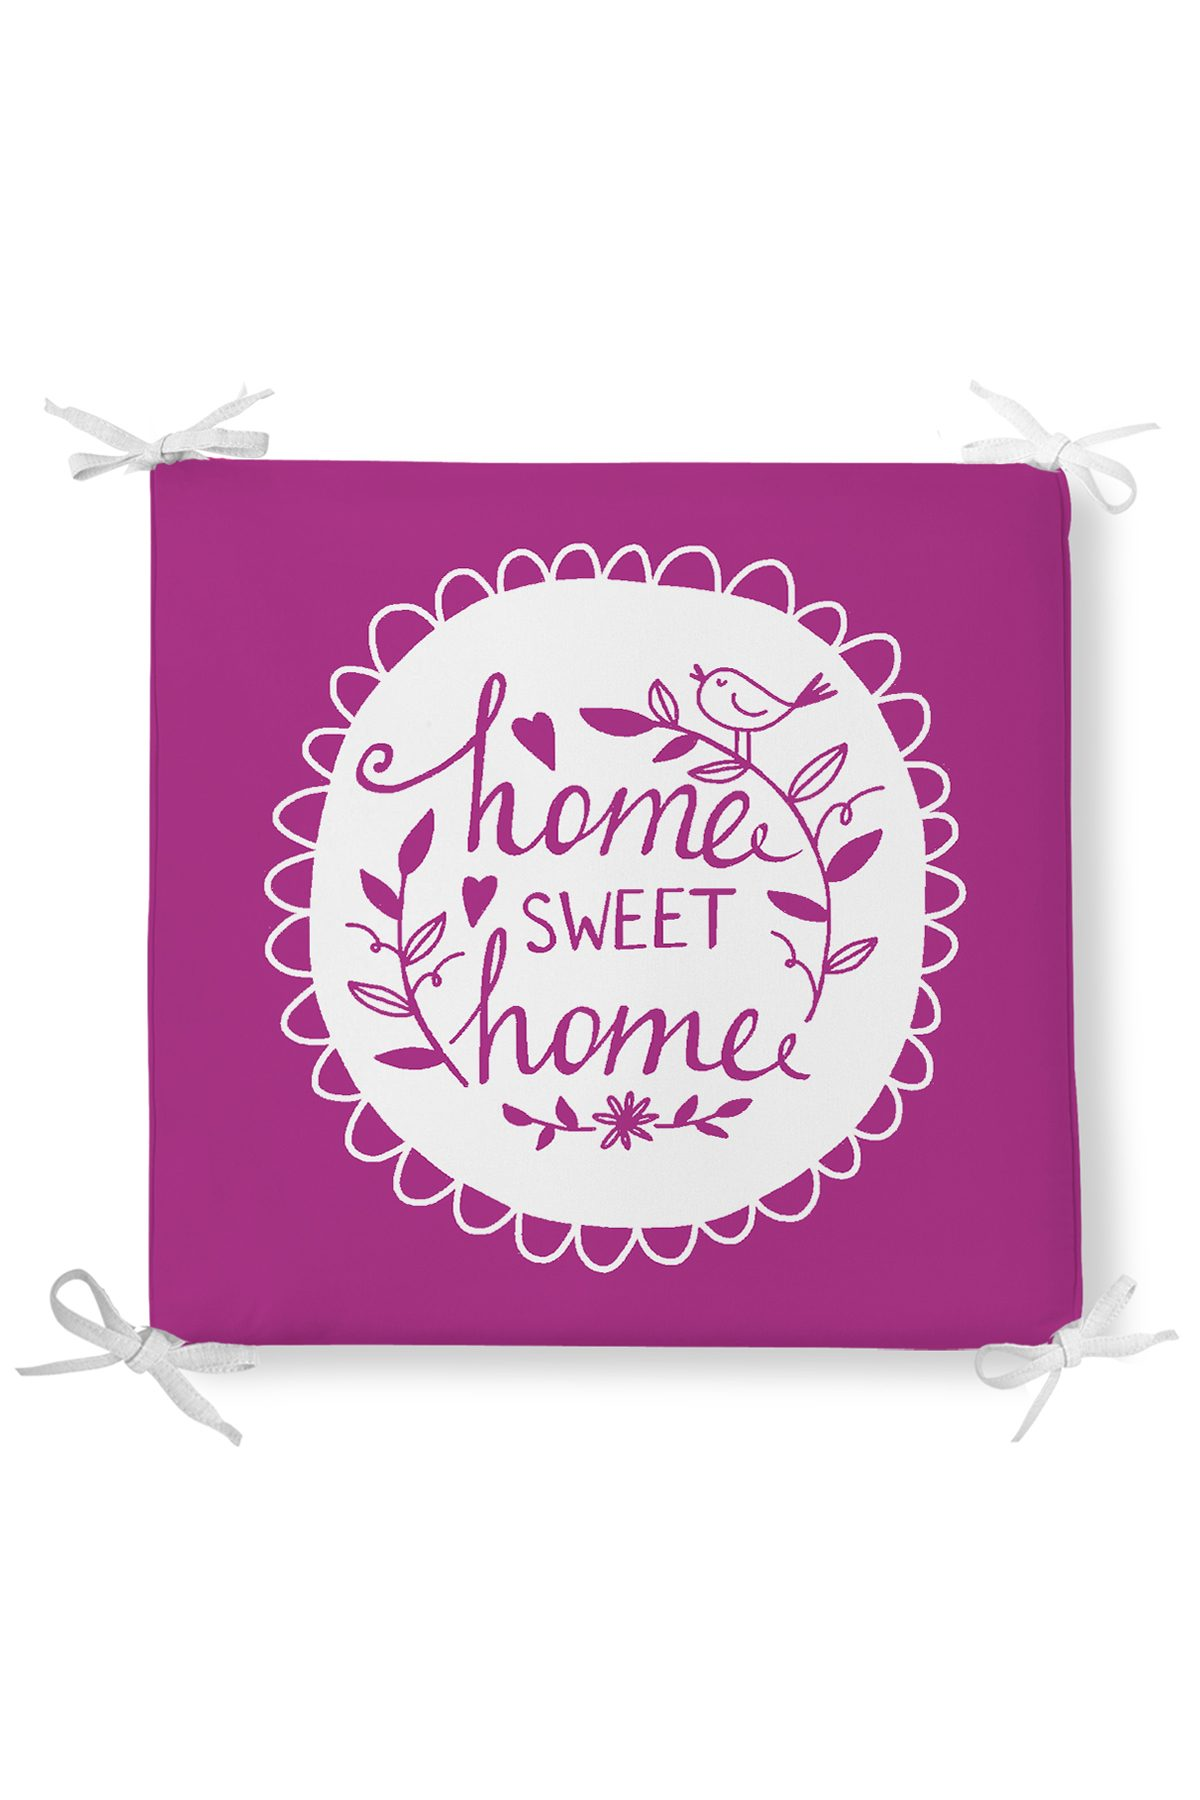 Home Sweet Home Dekorati Kare Sandalye Minderi 40x40cm ermuarlı Realhomes